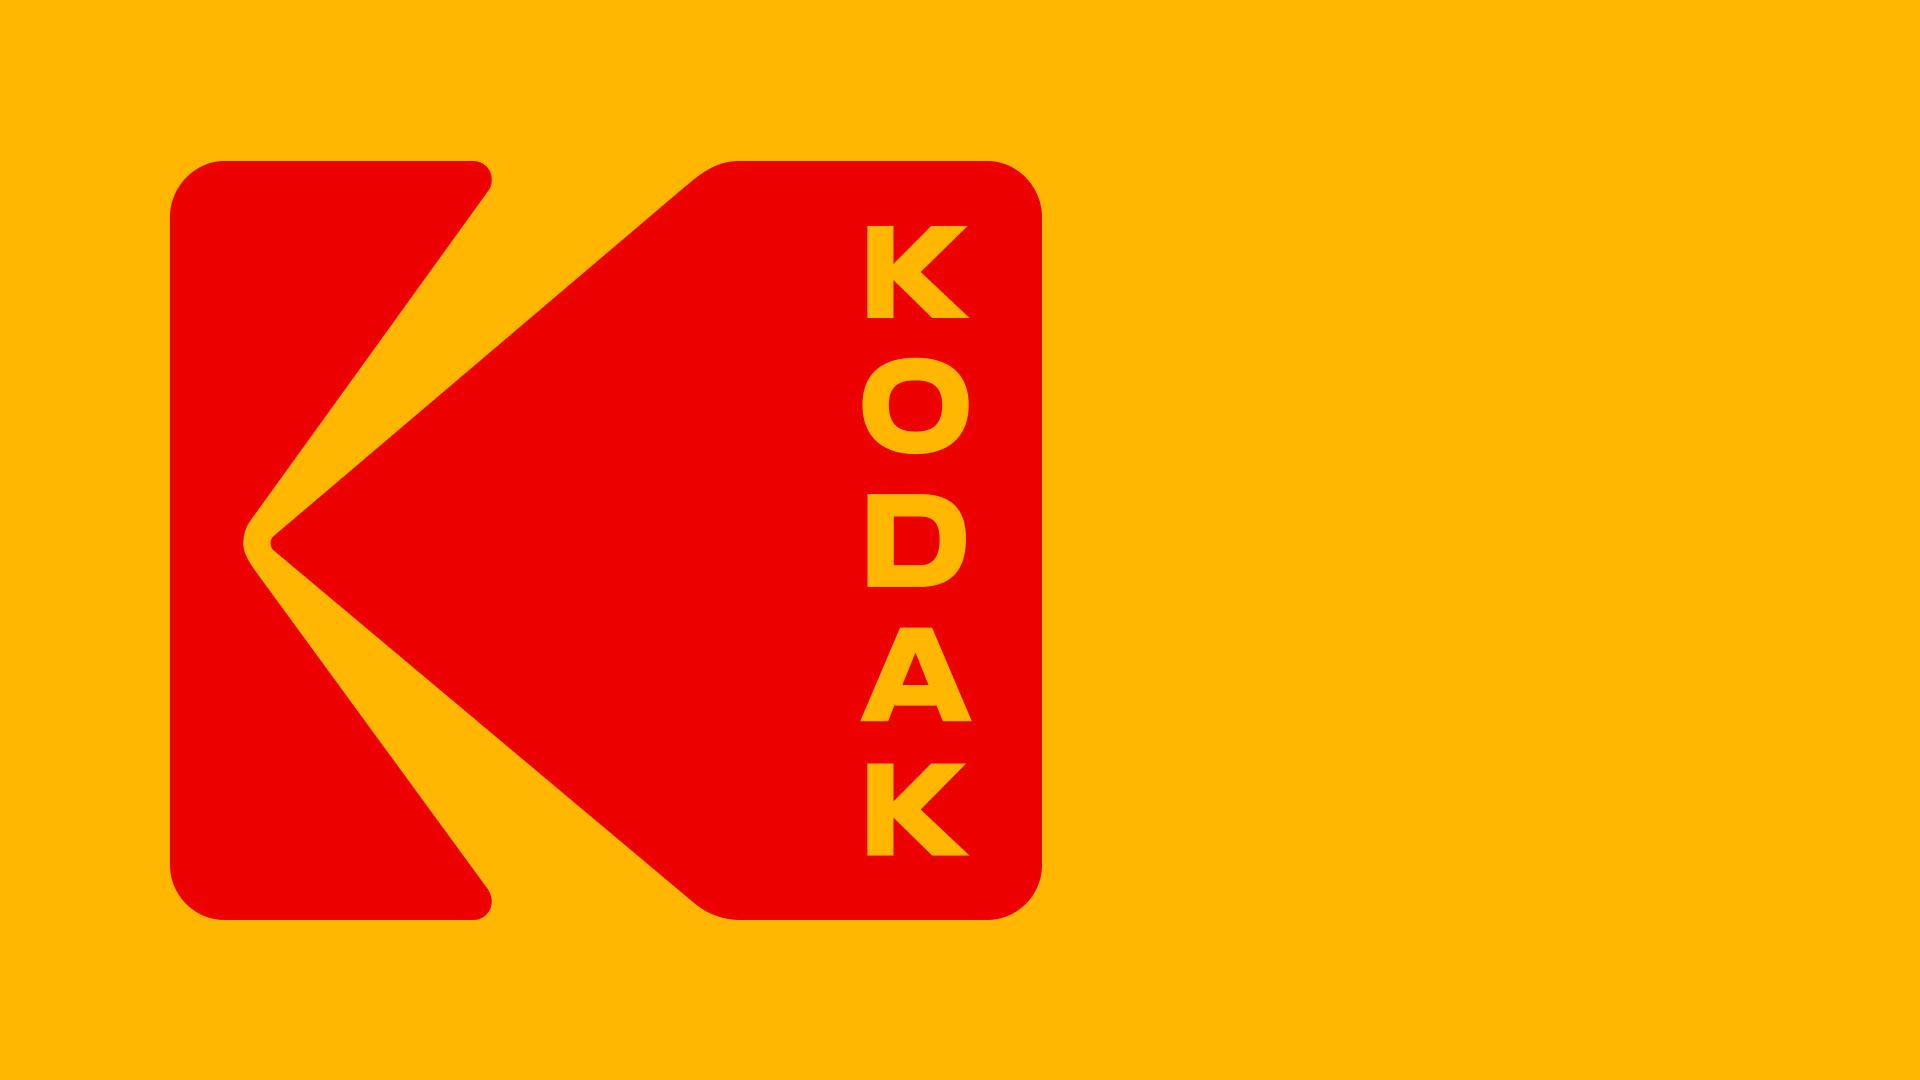 Kodak logo branding